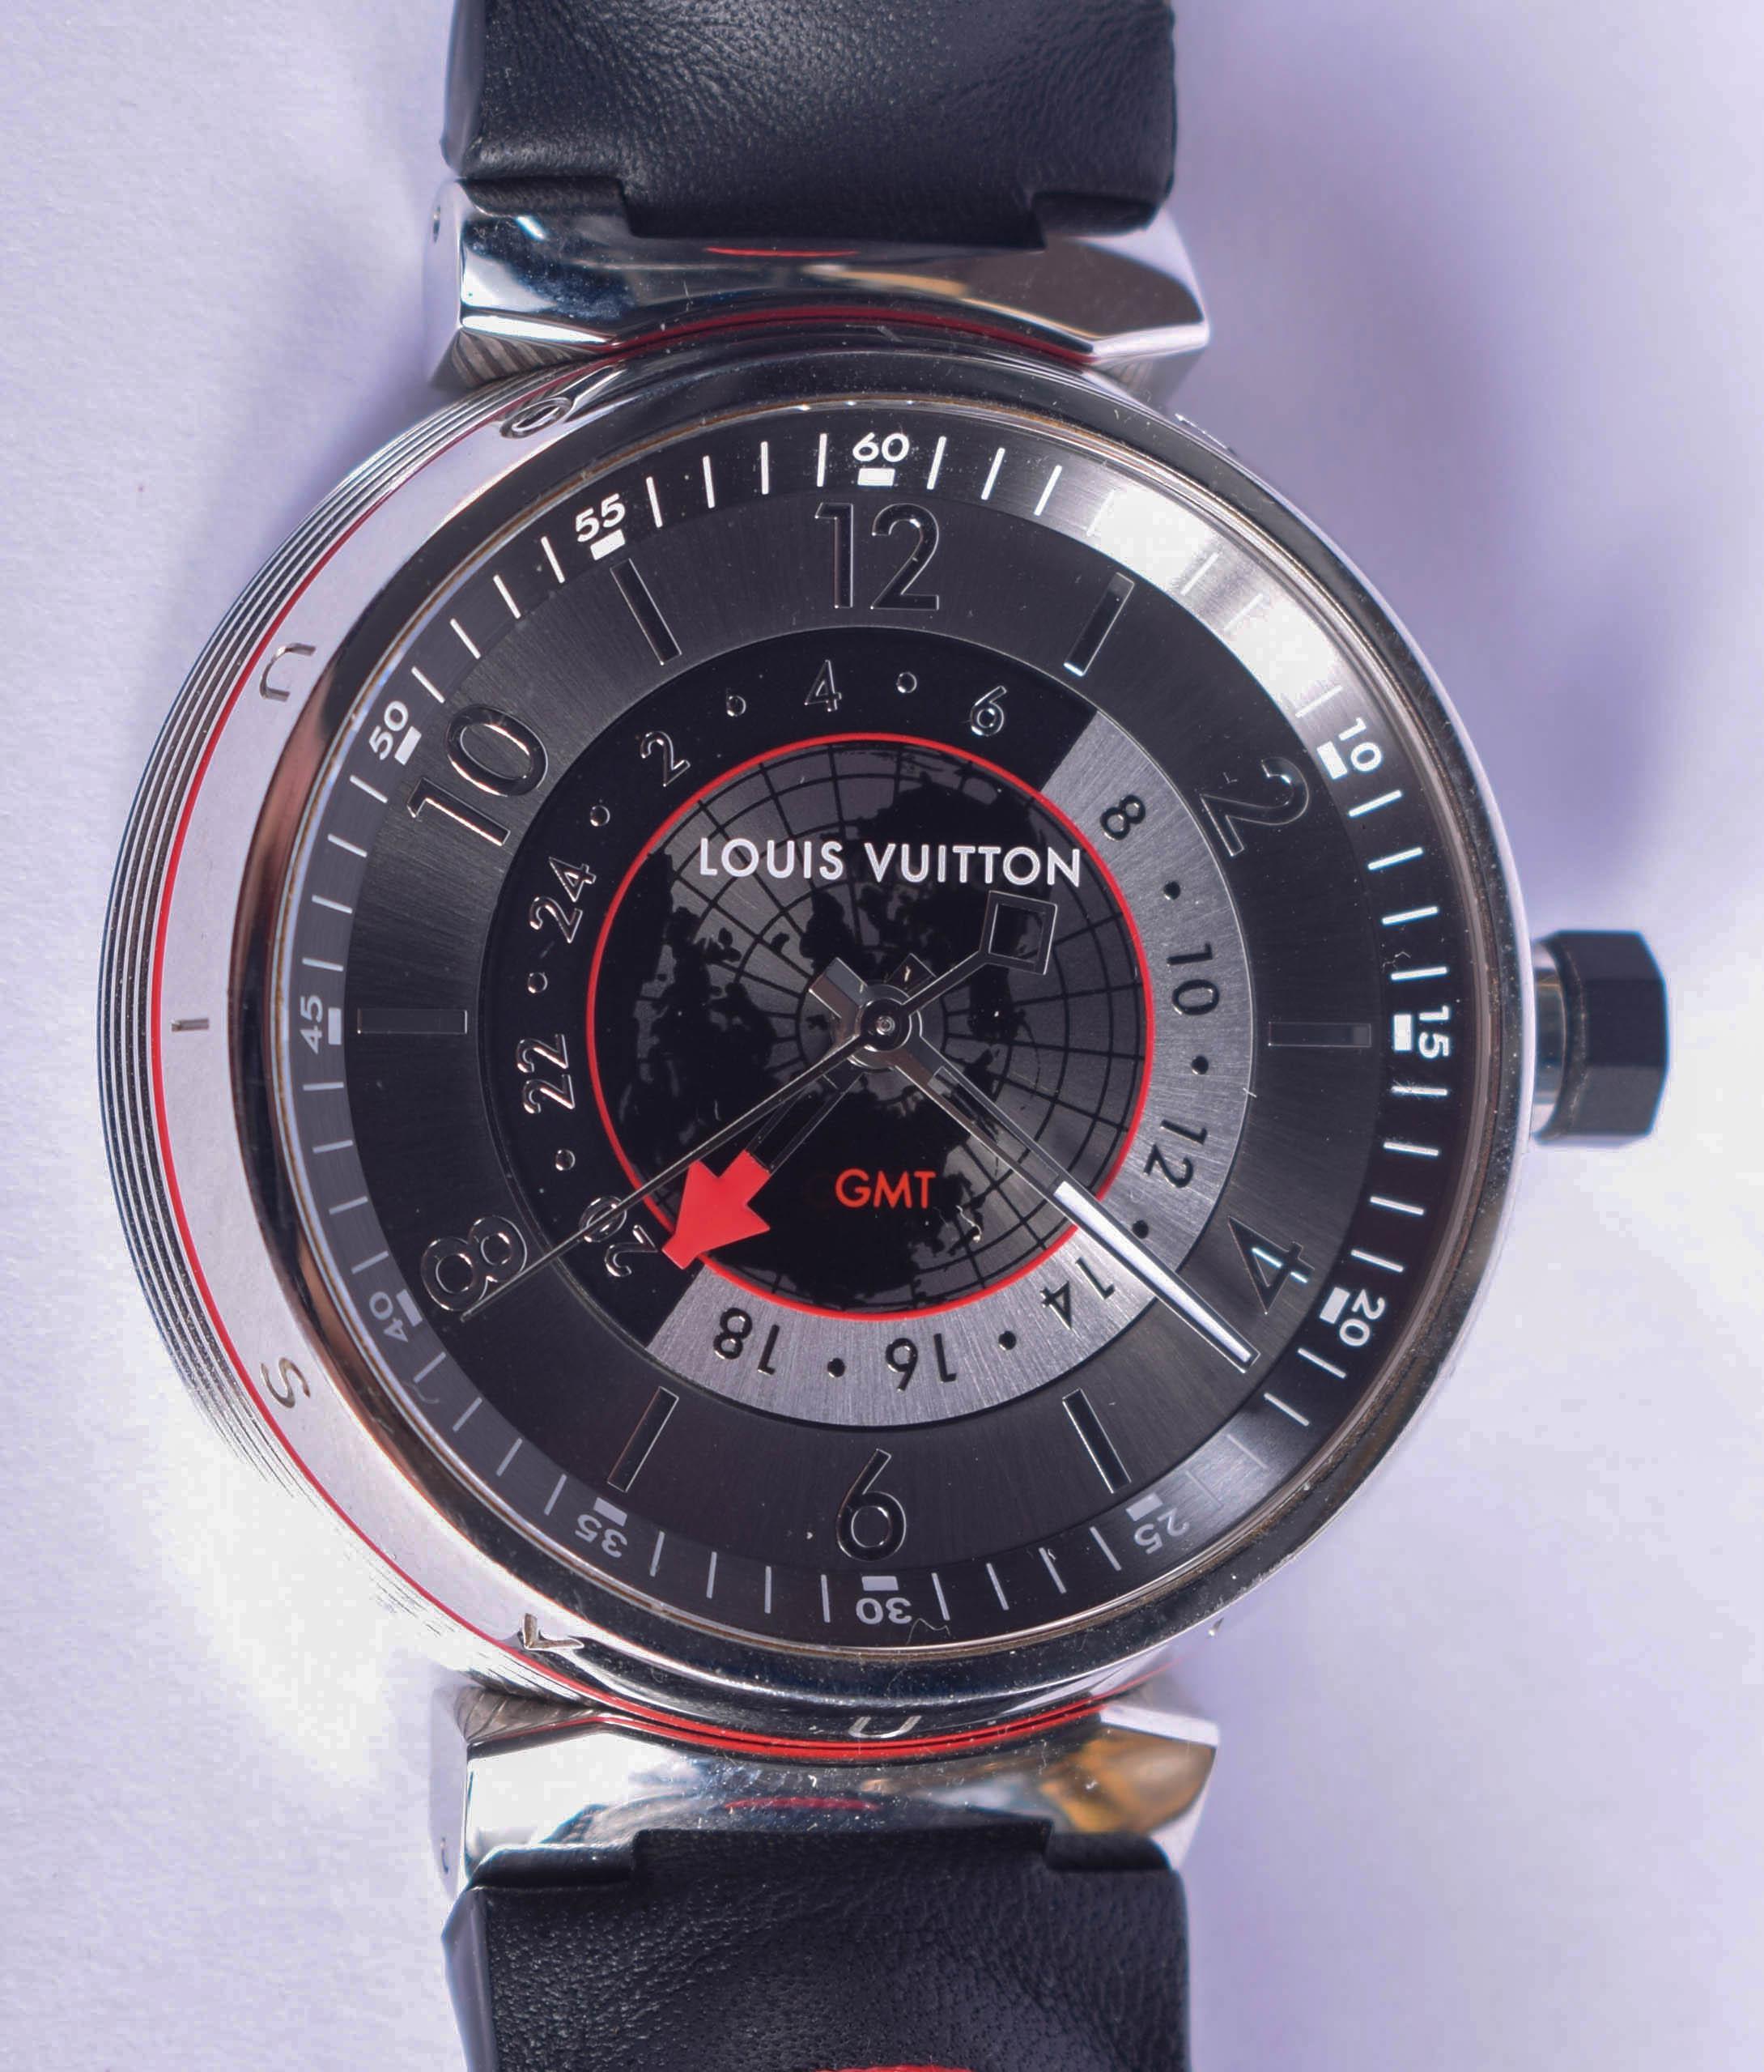 A BOXED LOUIS VUITTON GMT GLOBE WRISTWATCH. 3.5 cm wide.